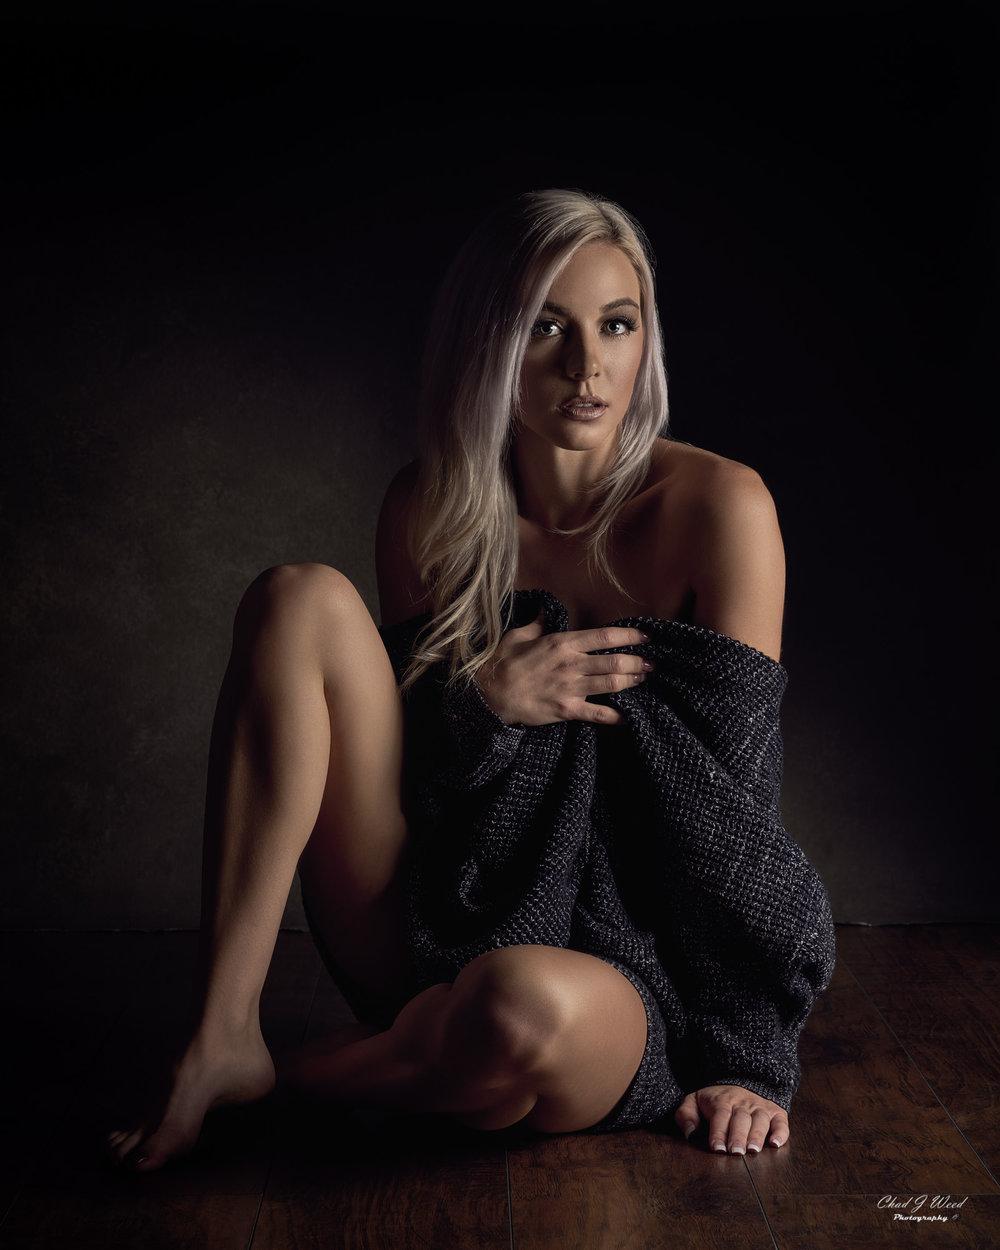 Mesa Arizona Portrait Photographer Chad Weed of Model Taylor